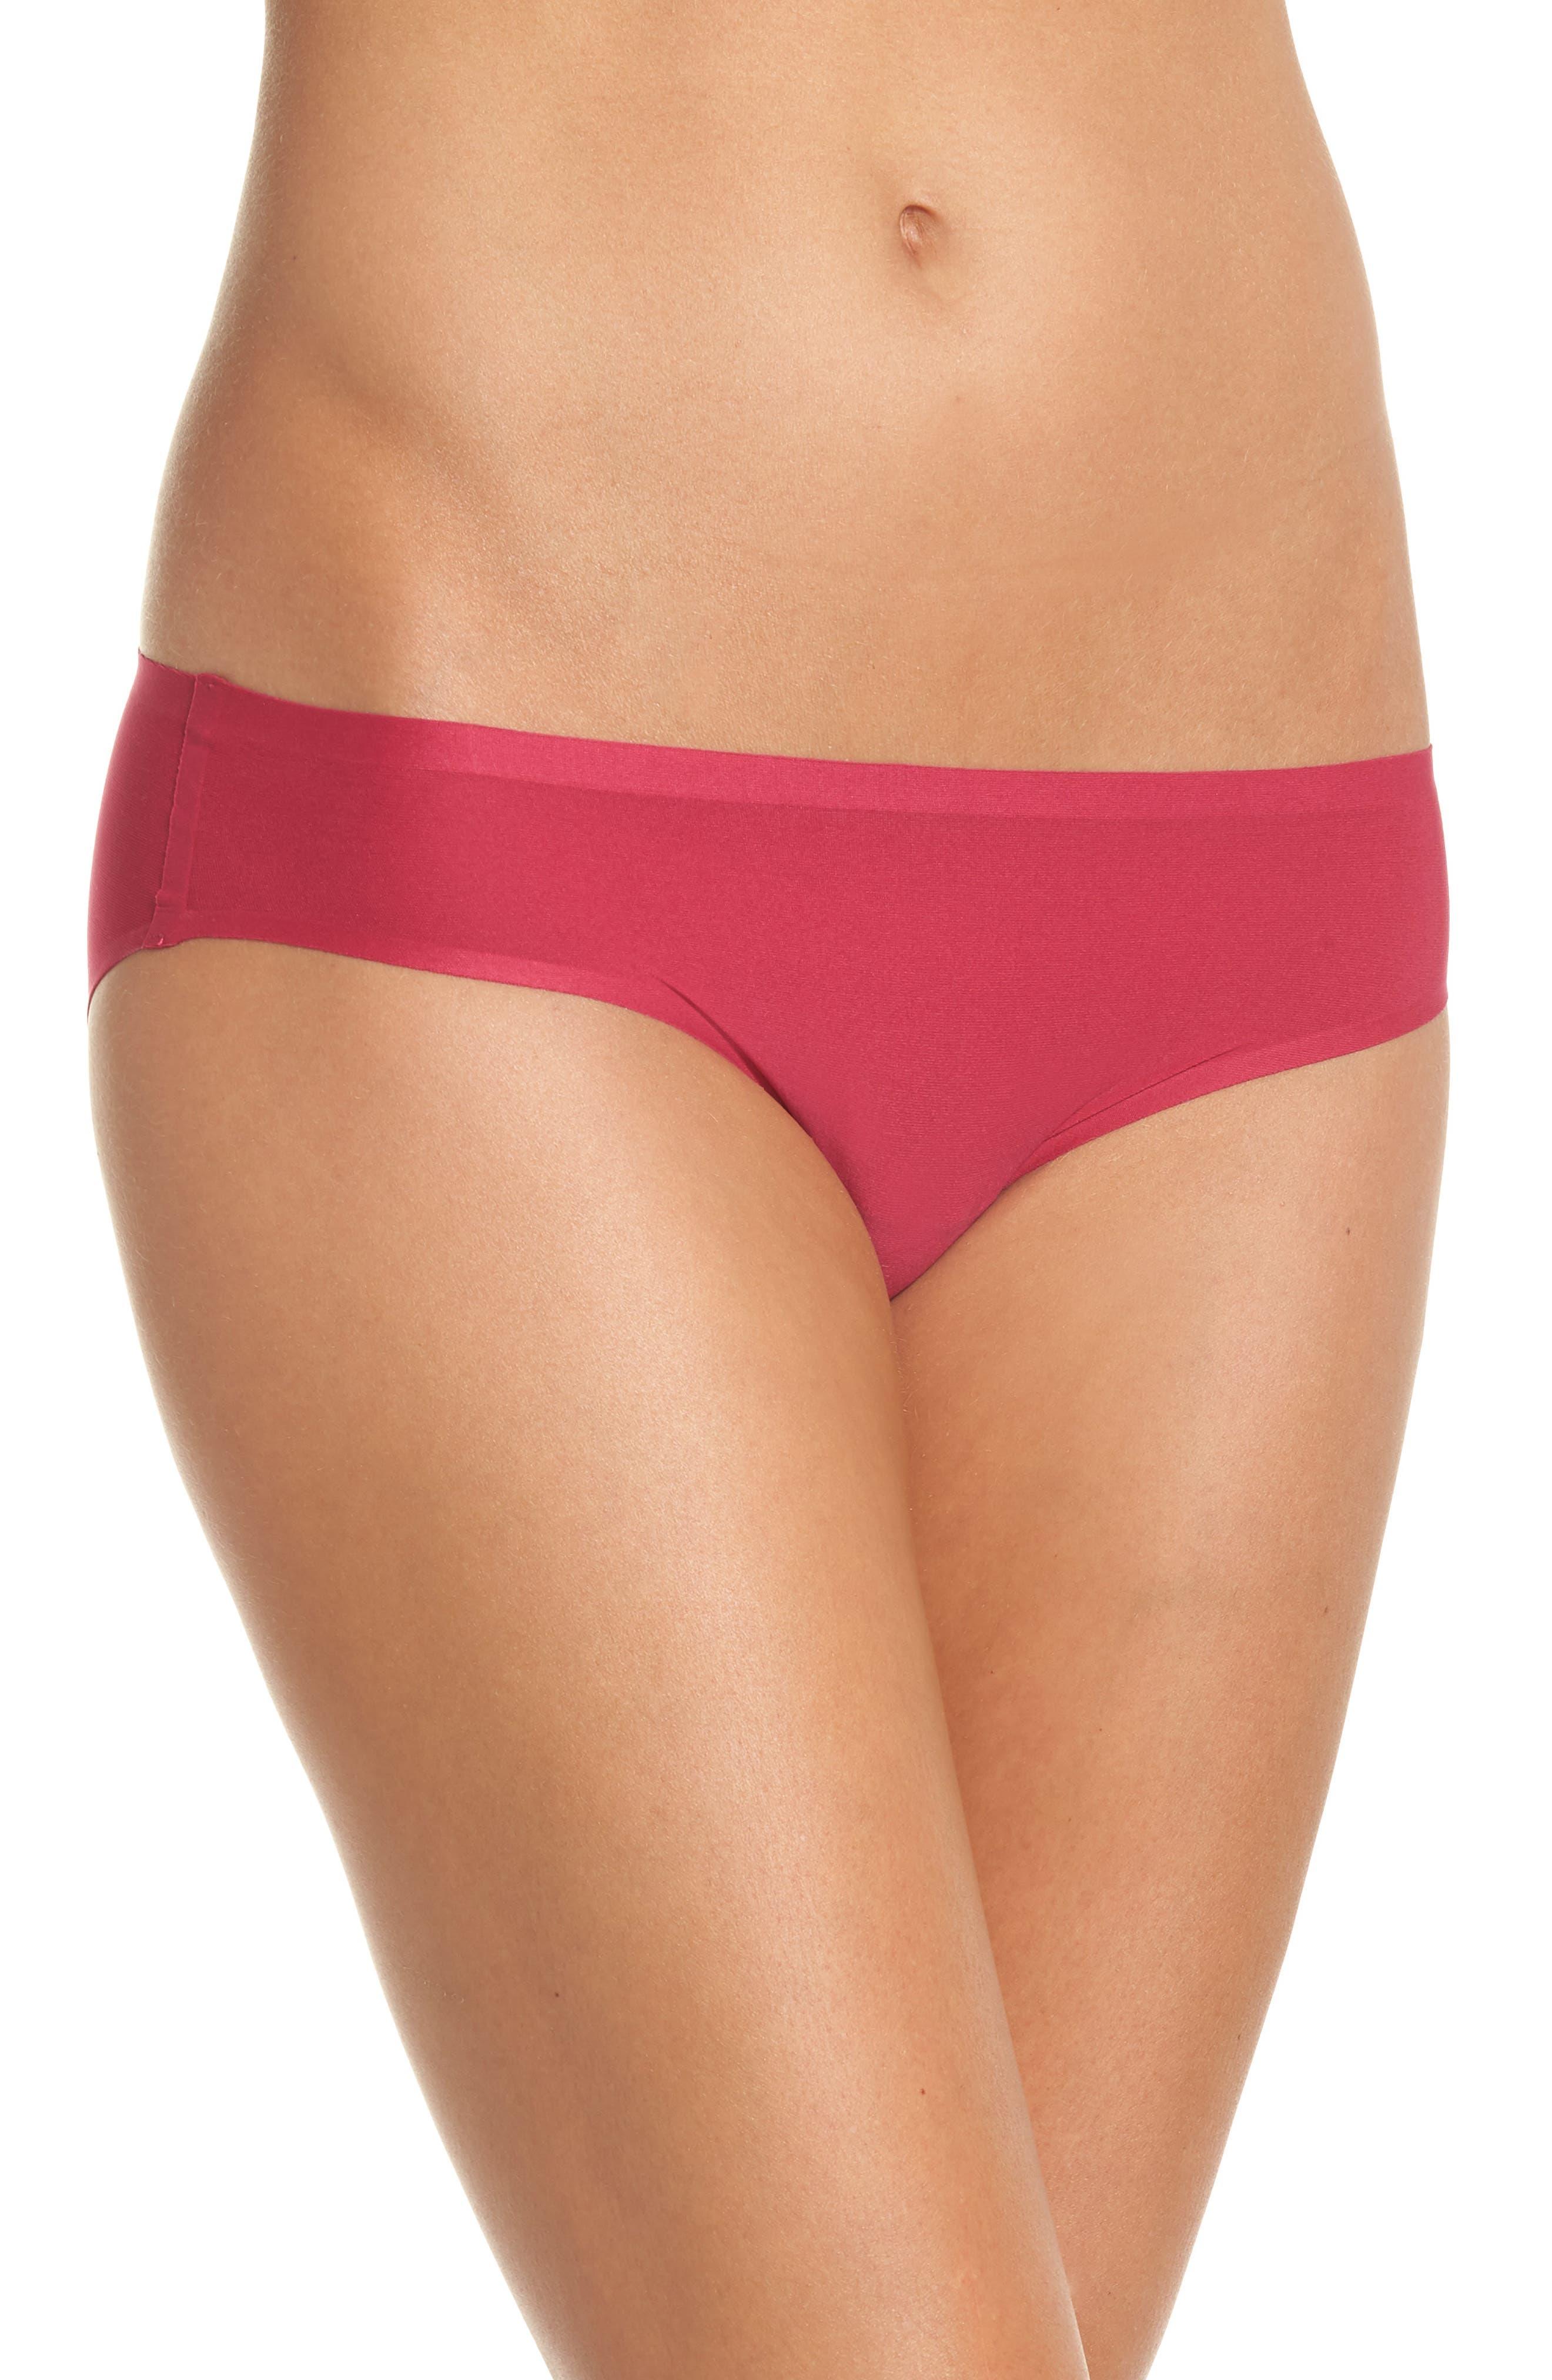 Soft Stretch Seamless Bikini,                         Main,                         color, MAGENTA